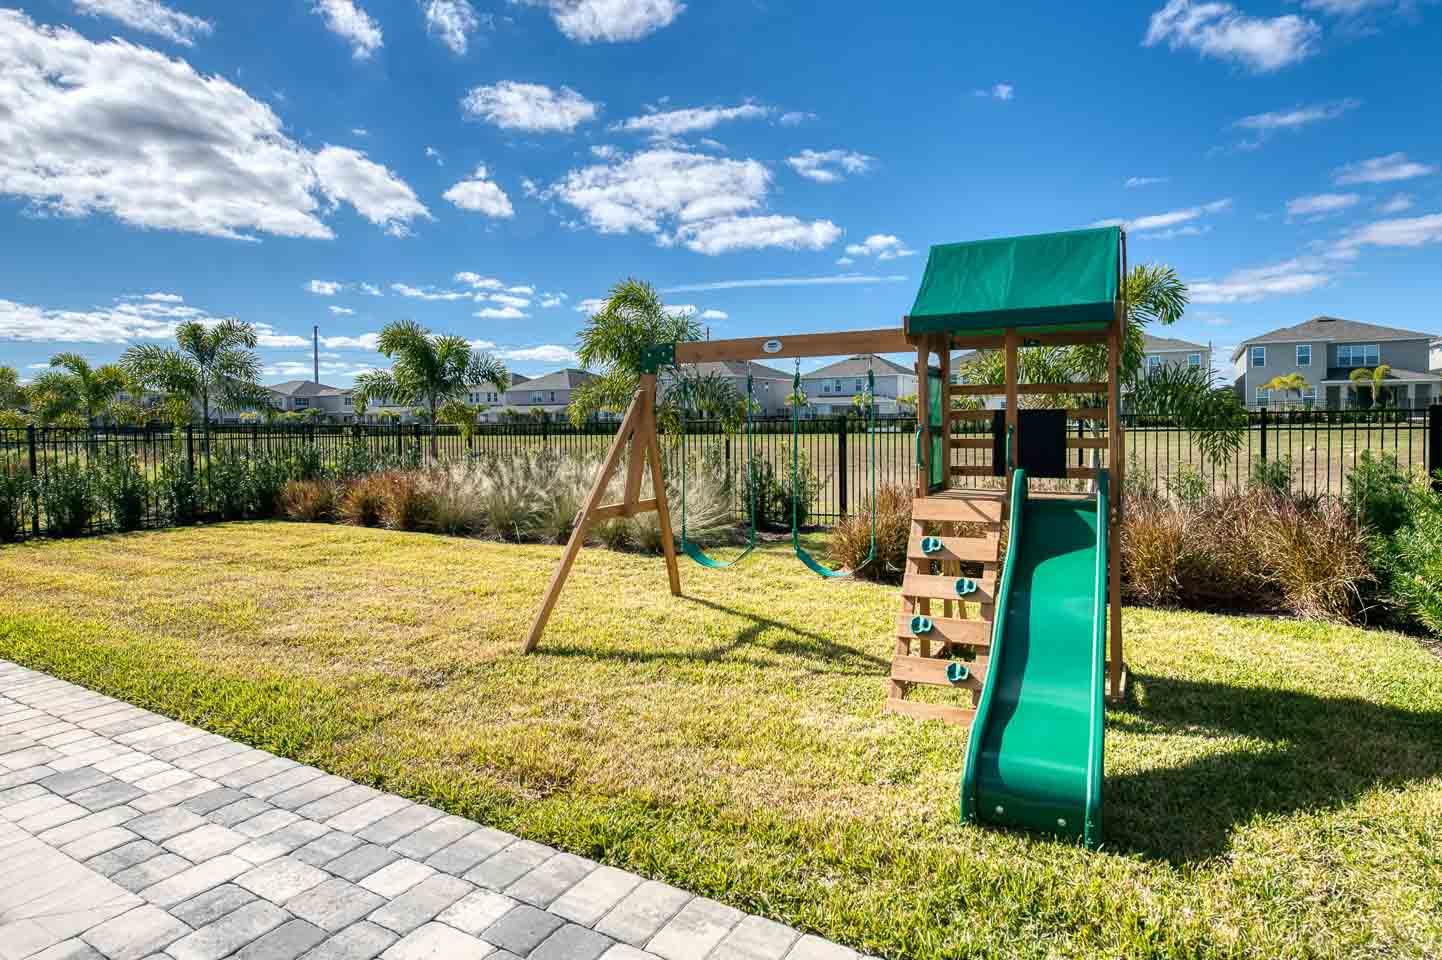 [amenities:Playground:3] Playground